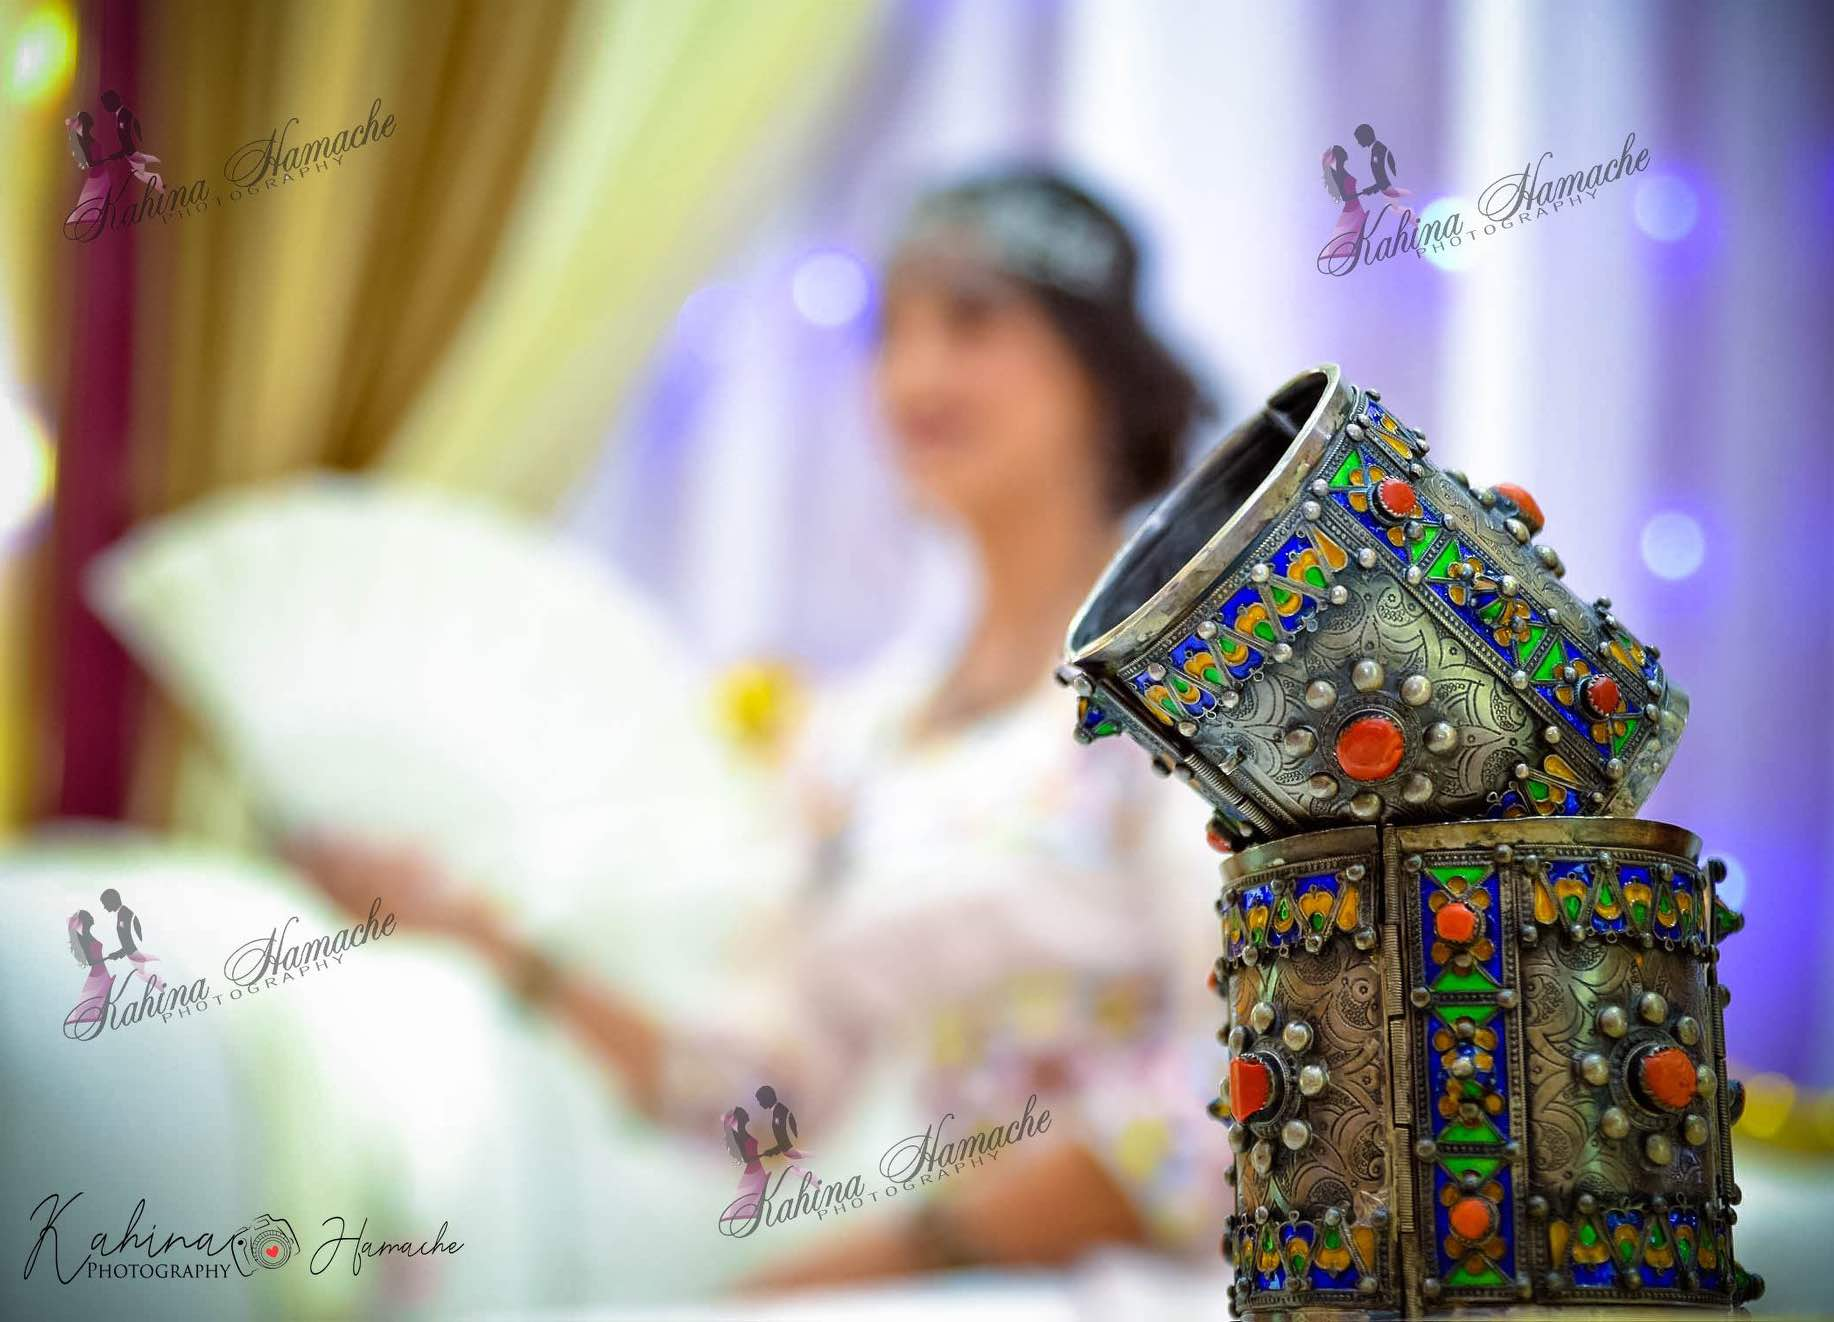 Kahina Hamache, photographe , Dar El Beïda, Alger - 3ersi.com